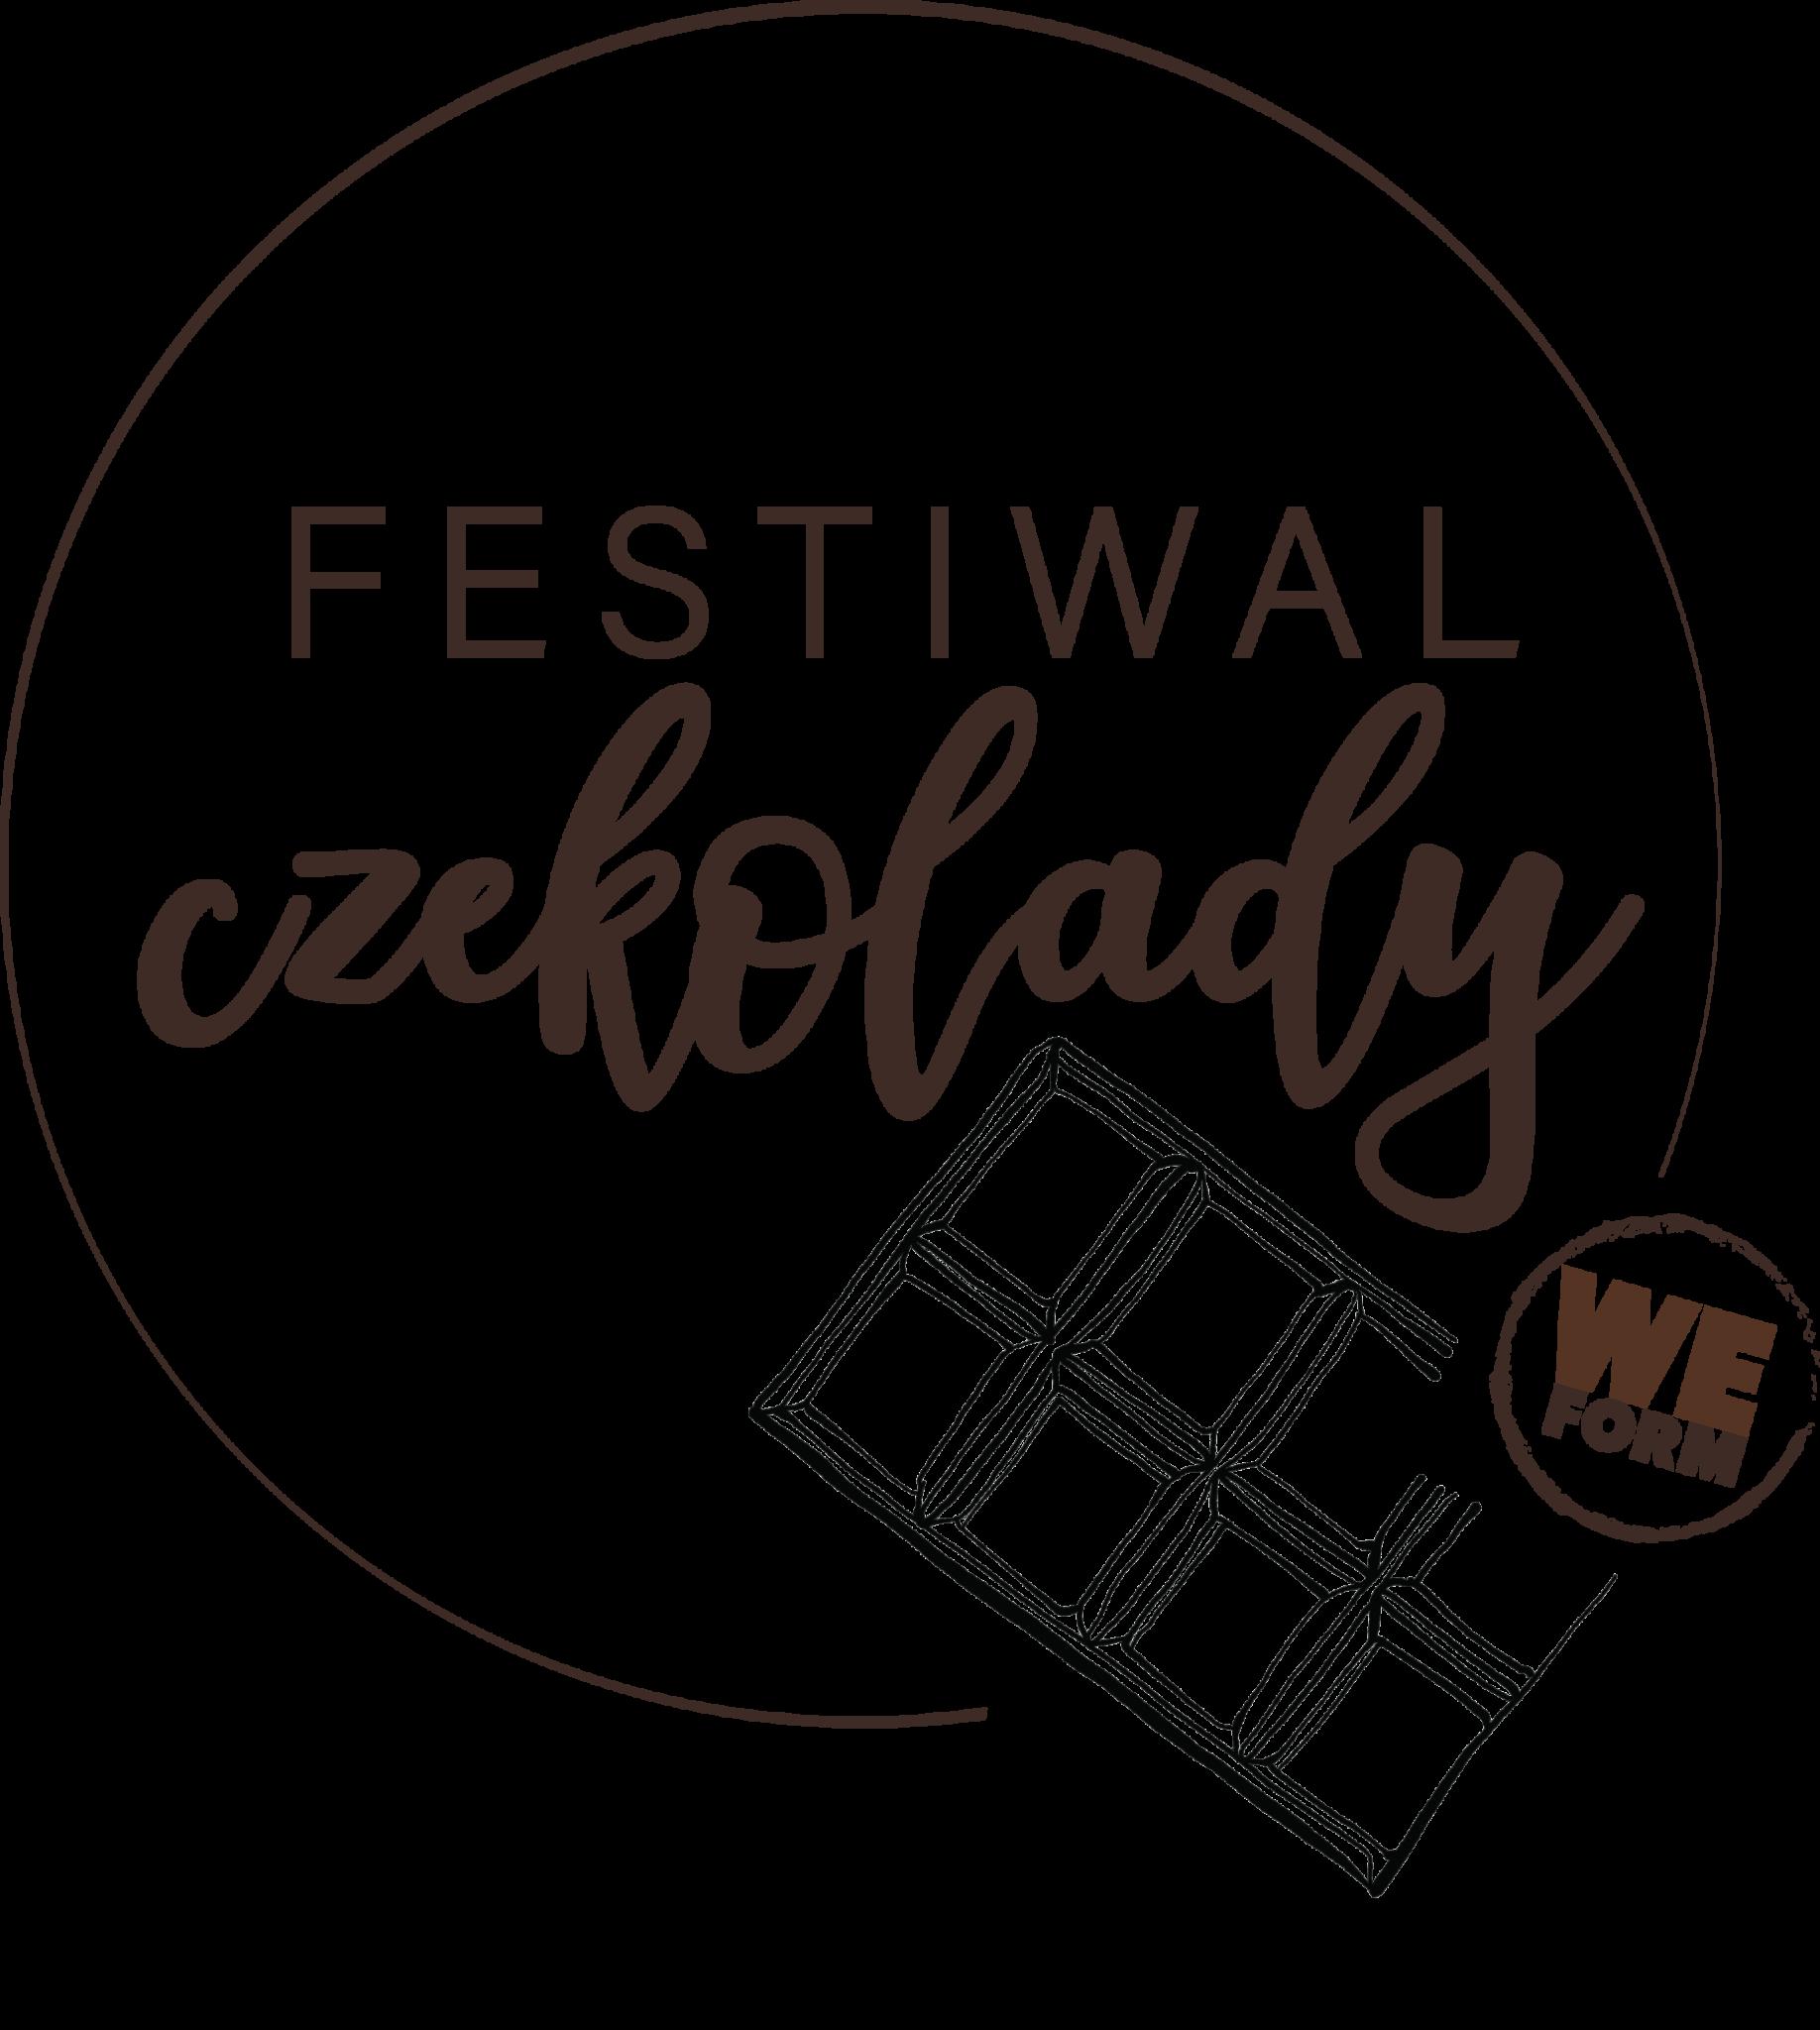 Festiwal Czekolady WeForm